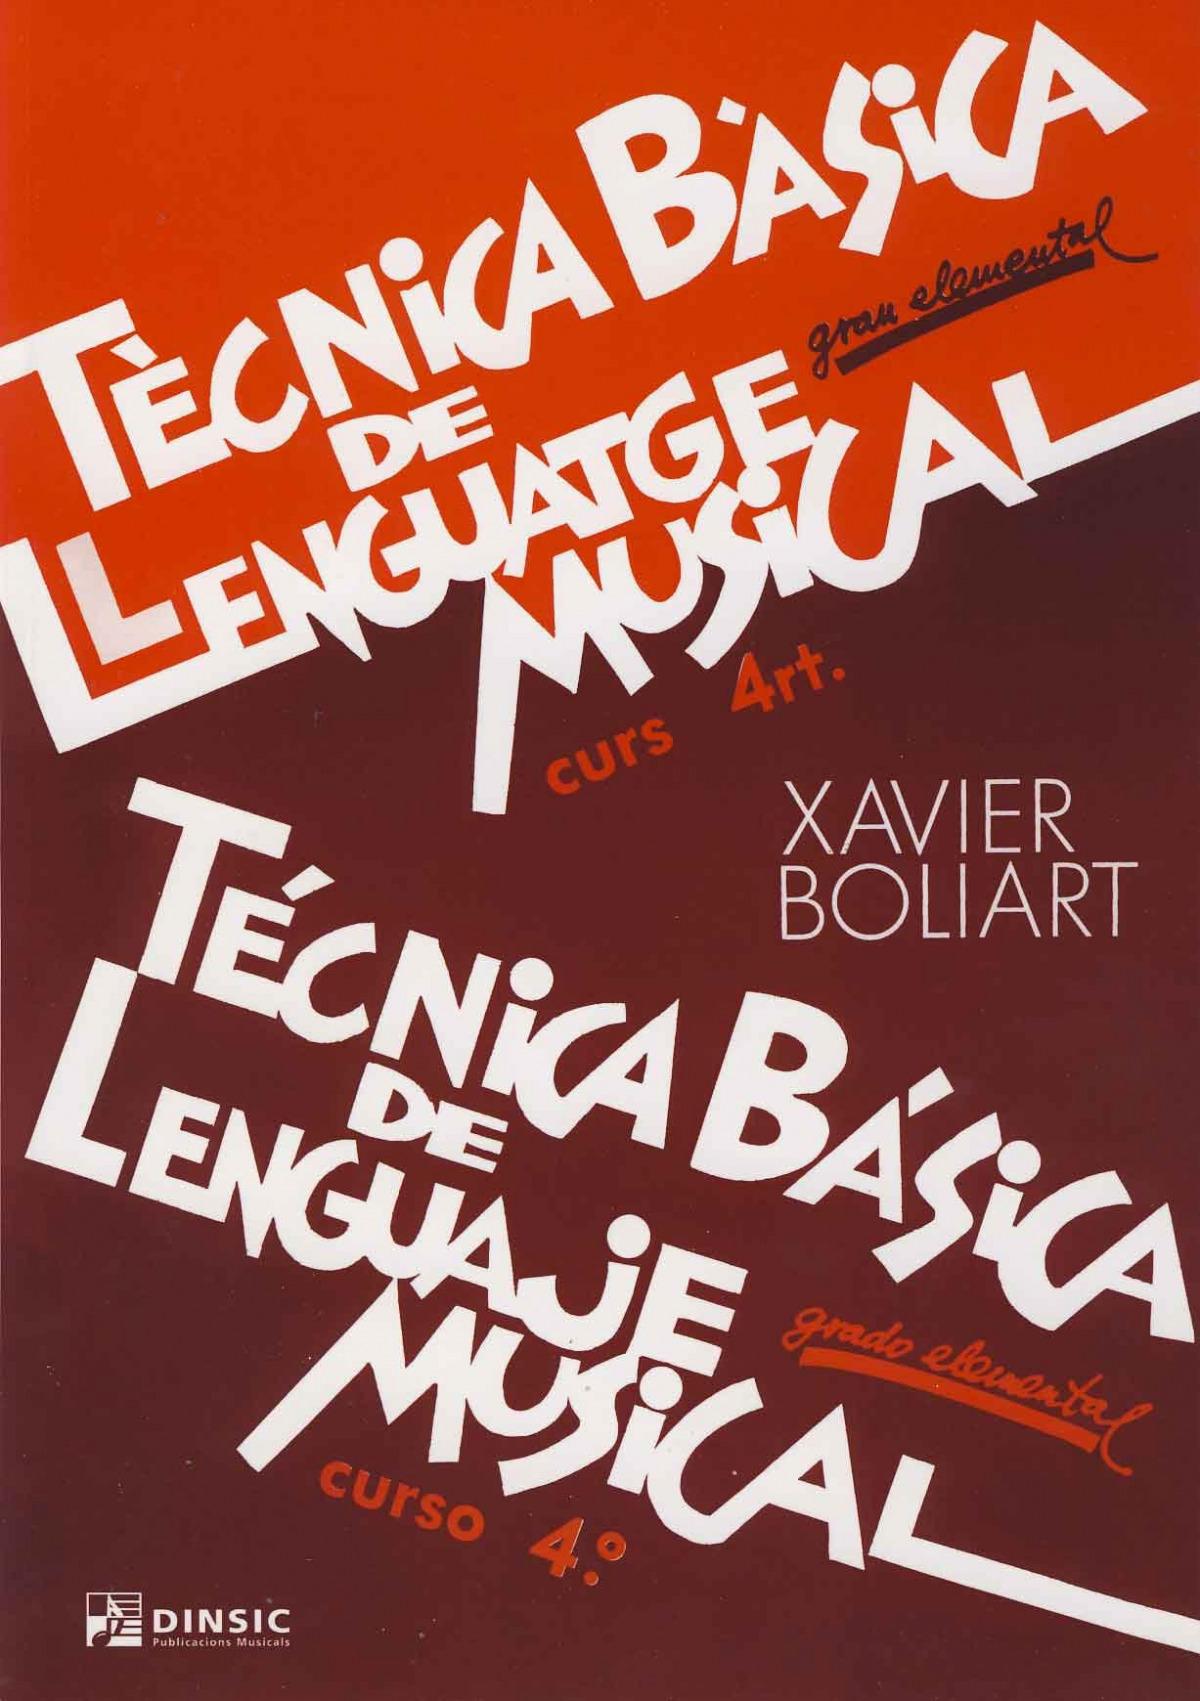 Técnica básica de lenguaje musical 4